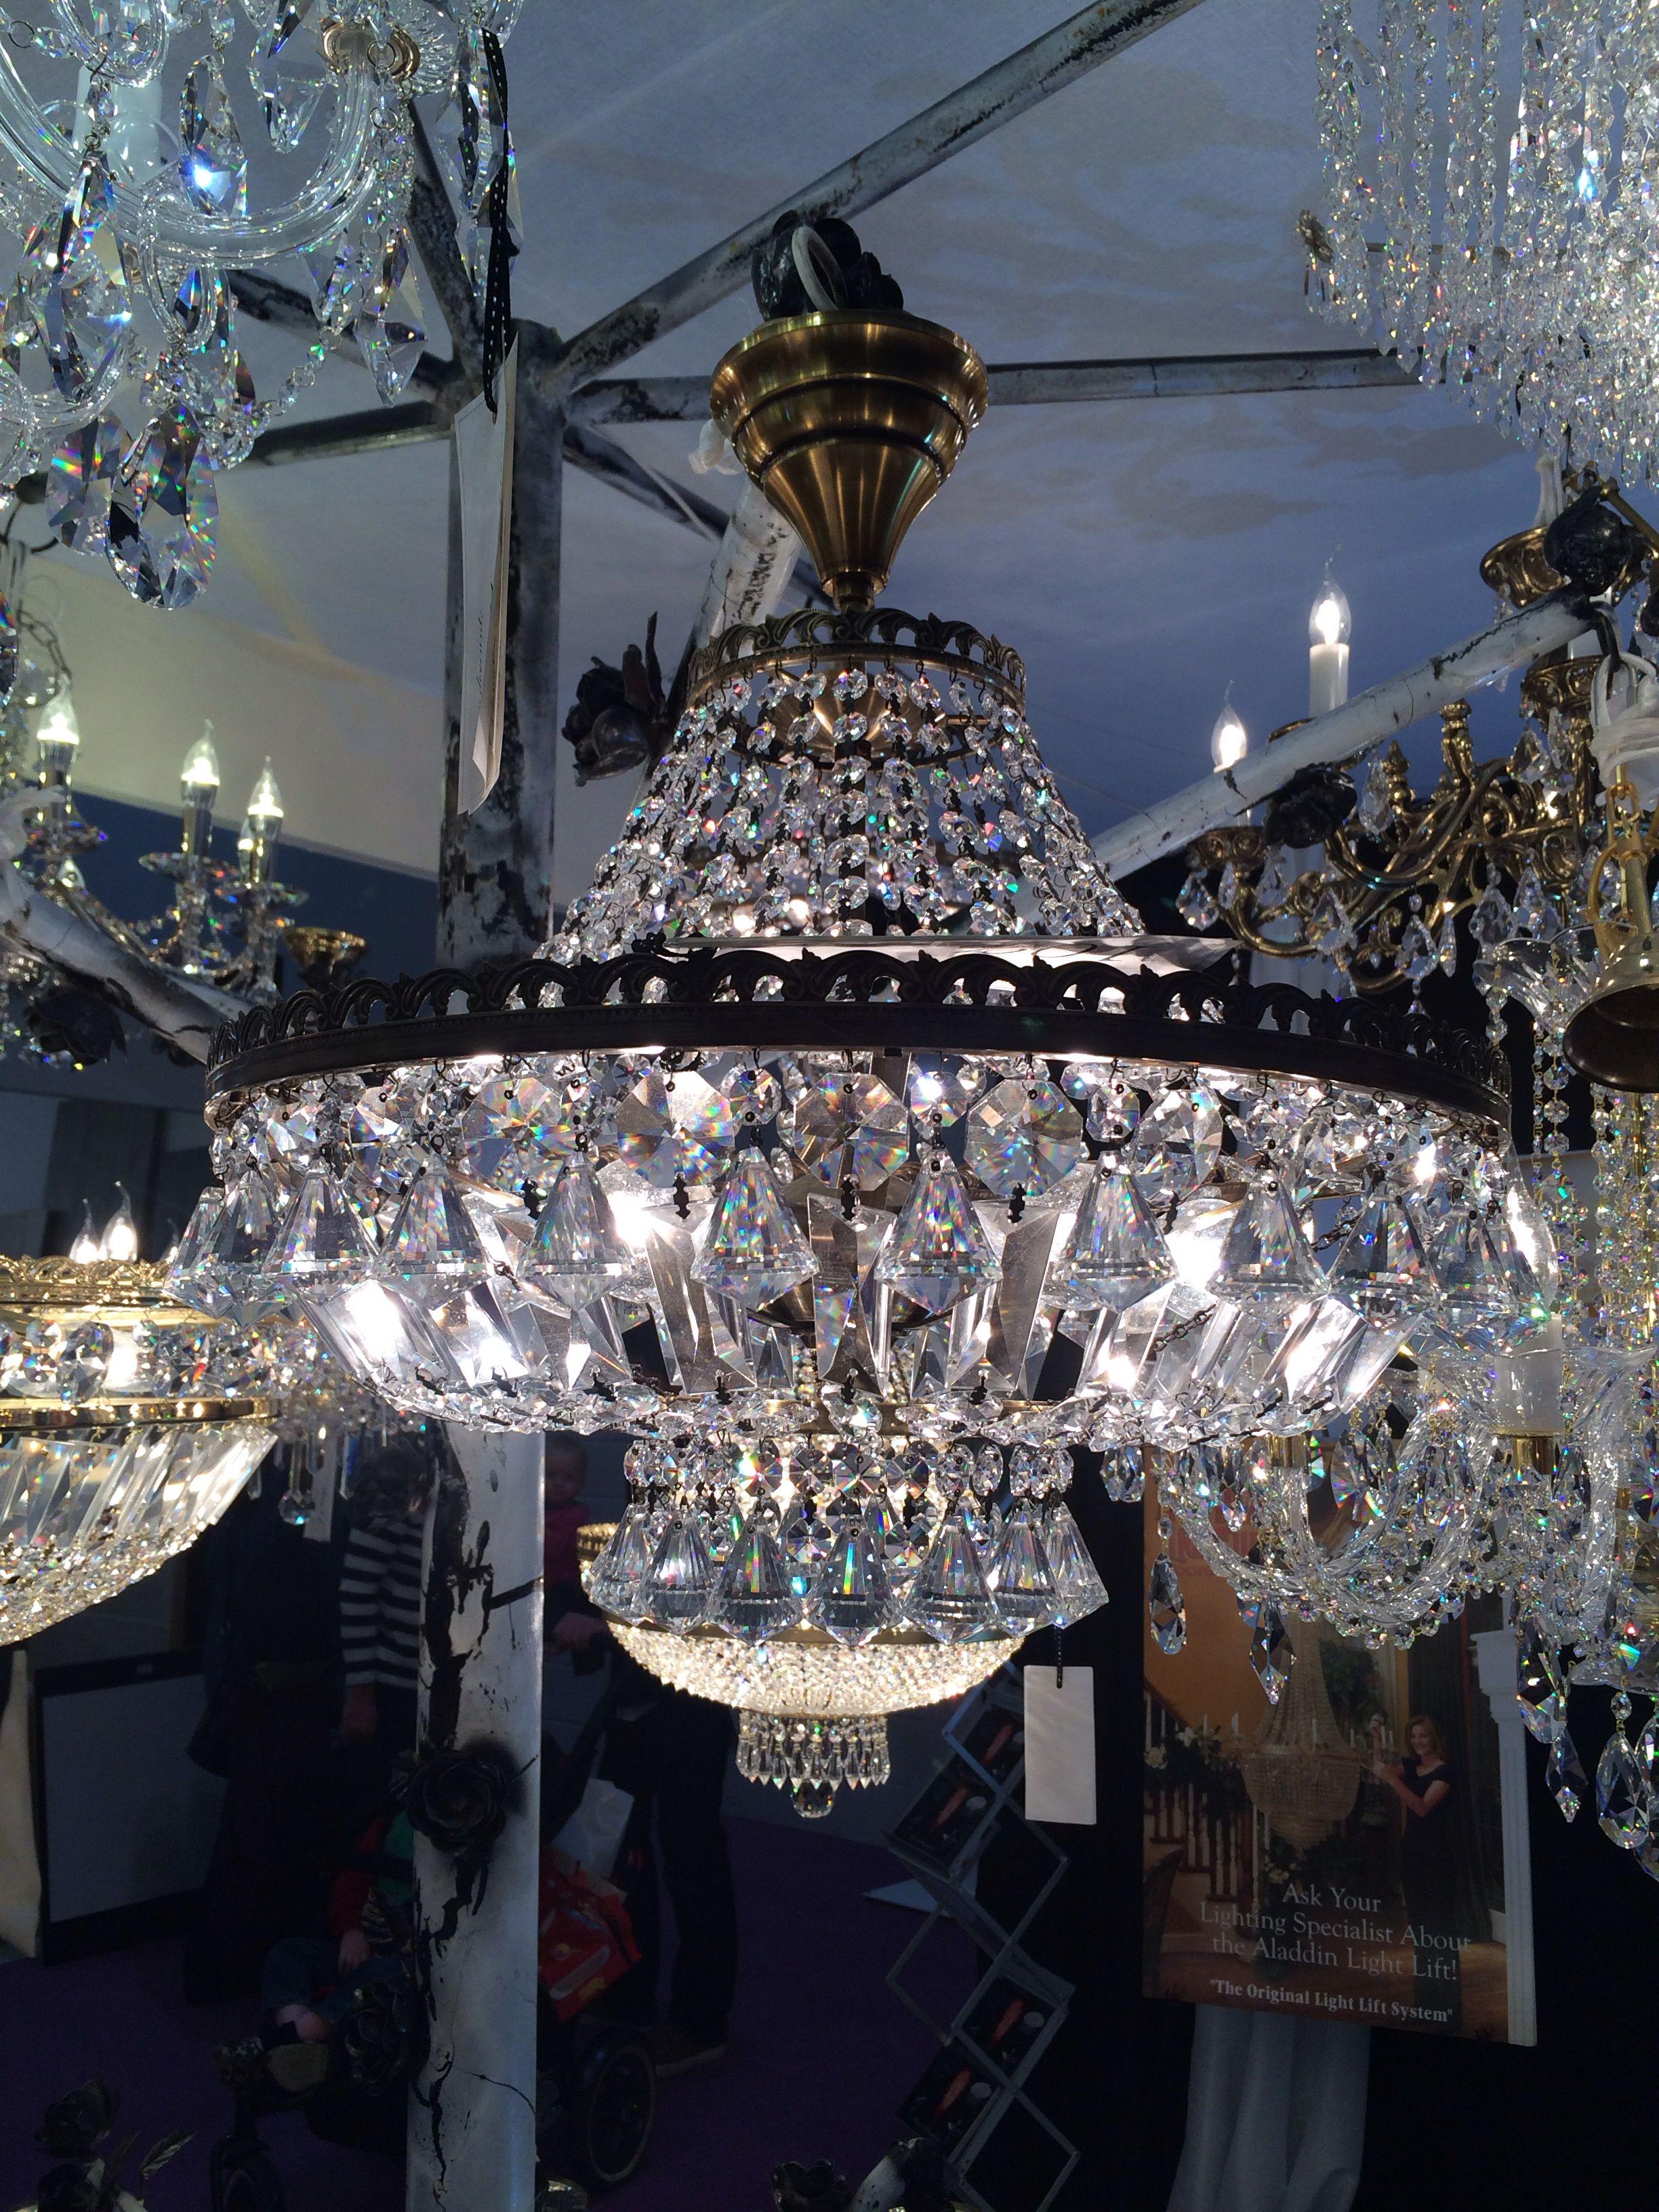 Chandelier From Vintage Wonderland Chandeliers Ceiling Lights Chandelier Light